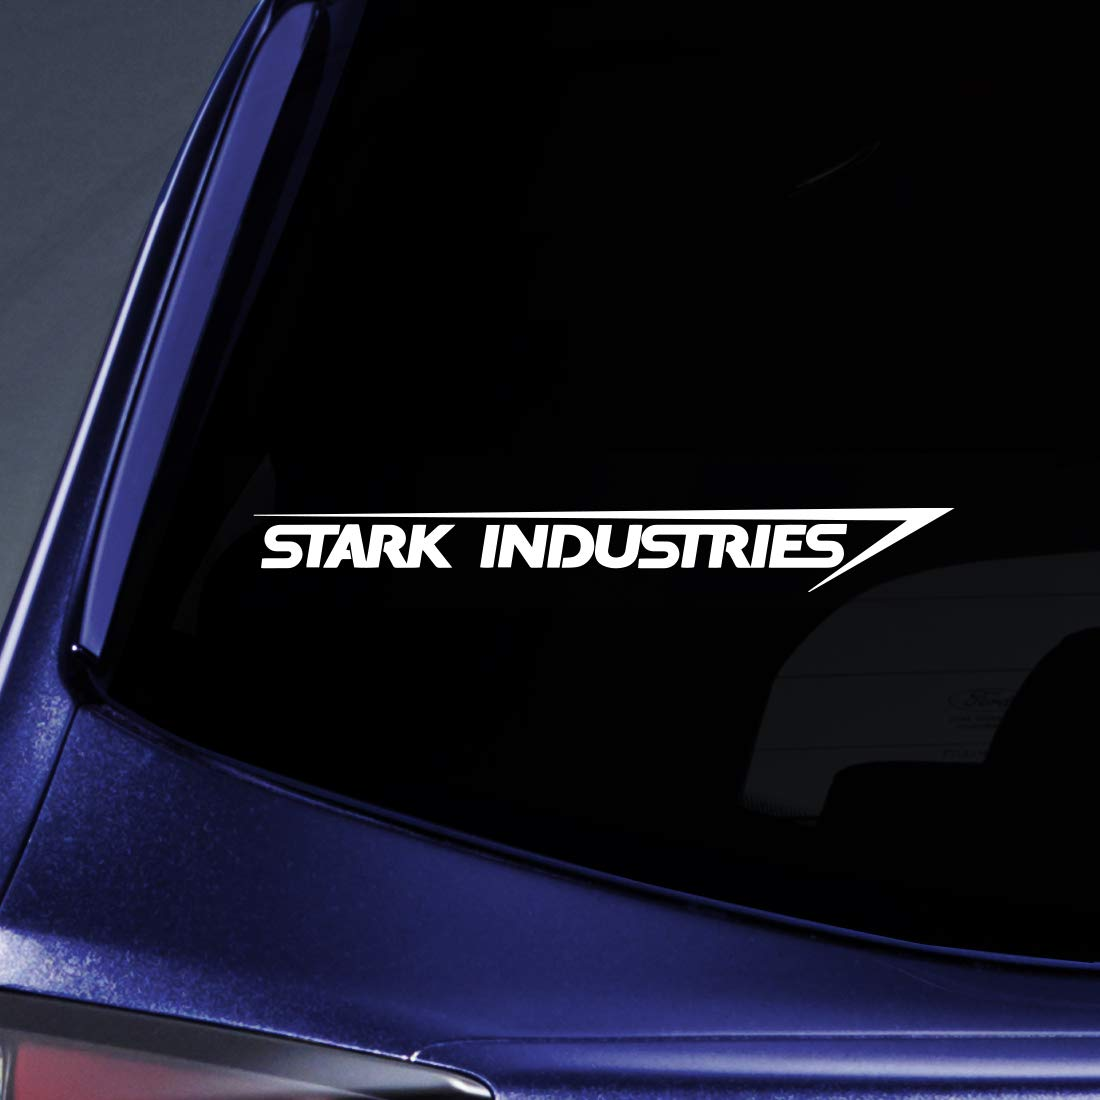 "Bargain Max Decals - Stark Industries Sticker Decal Notebook Car Laptop 8"" (White)"